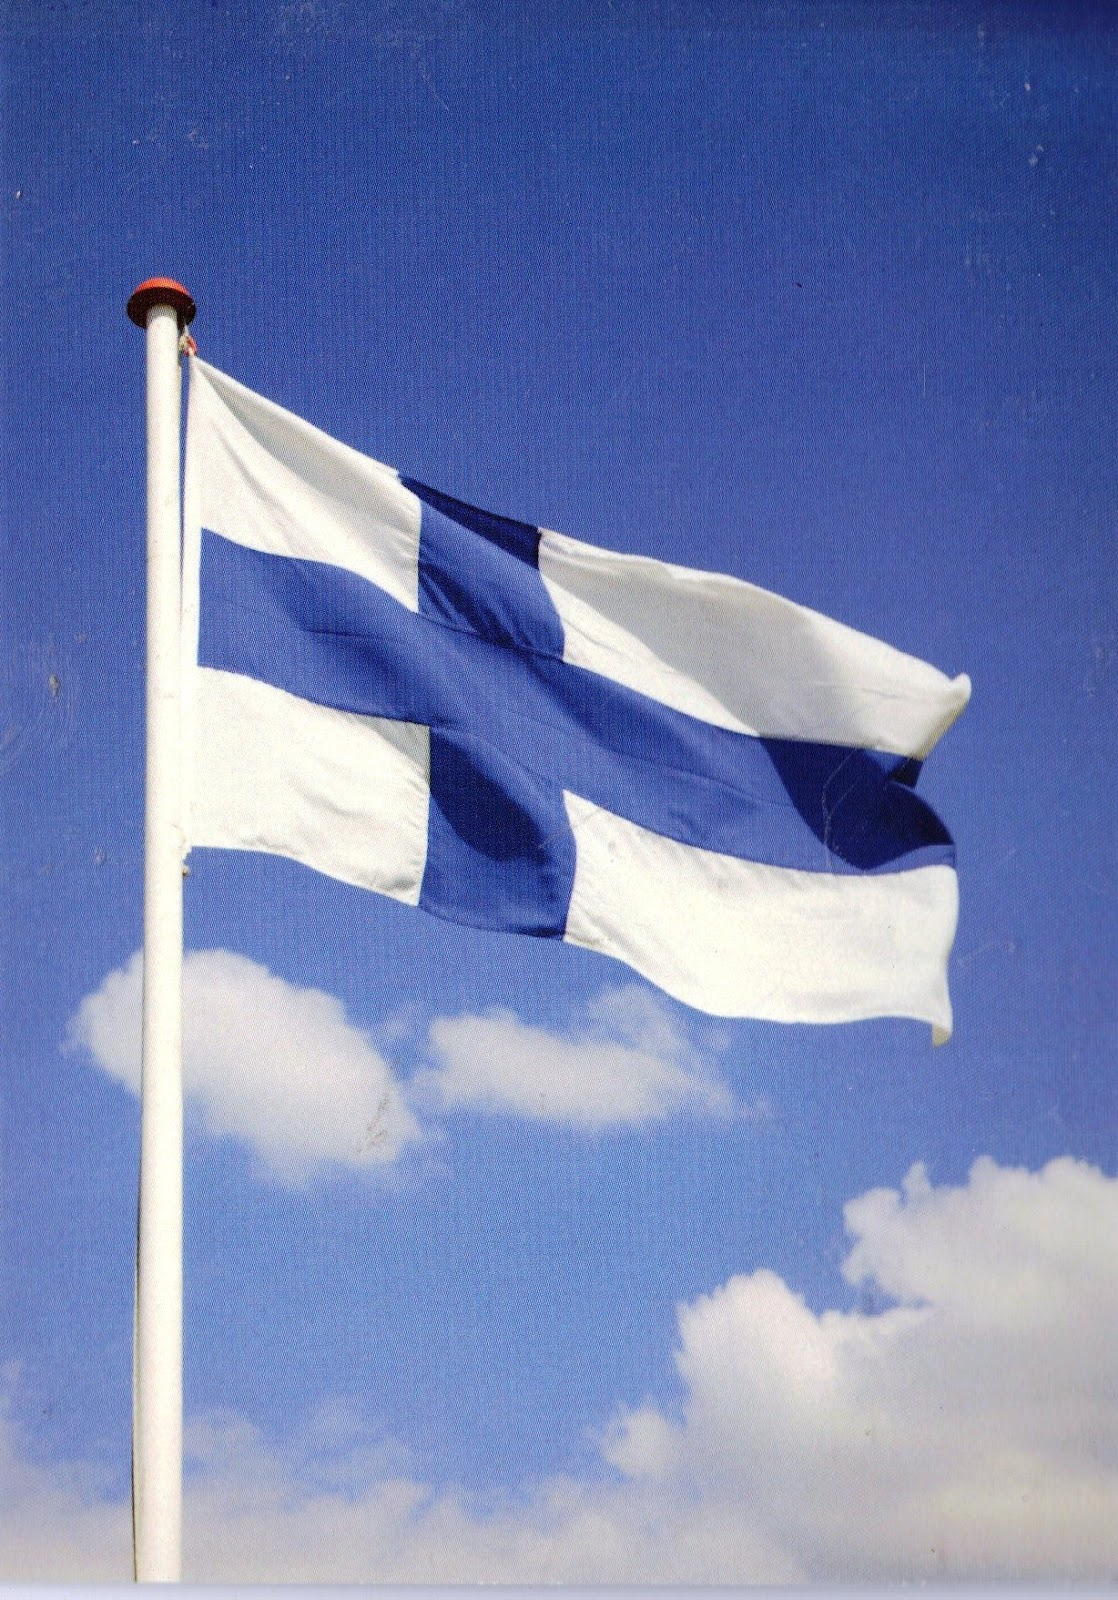 finlandia - photo #37